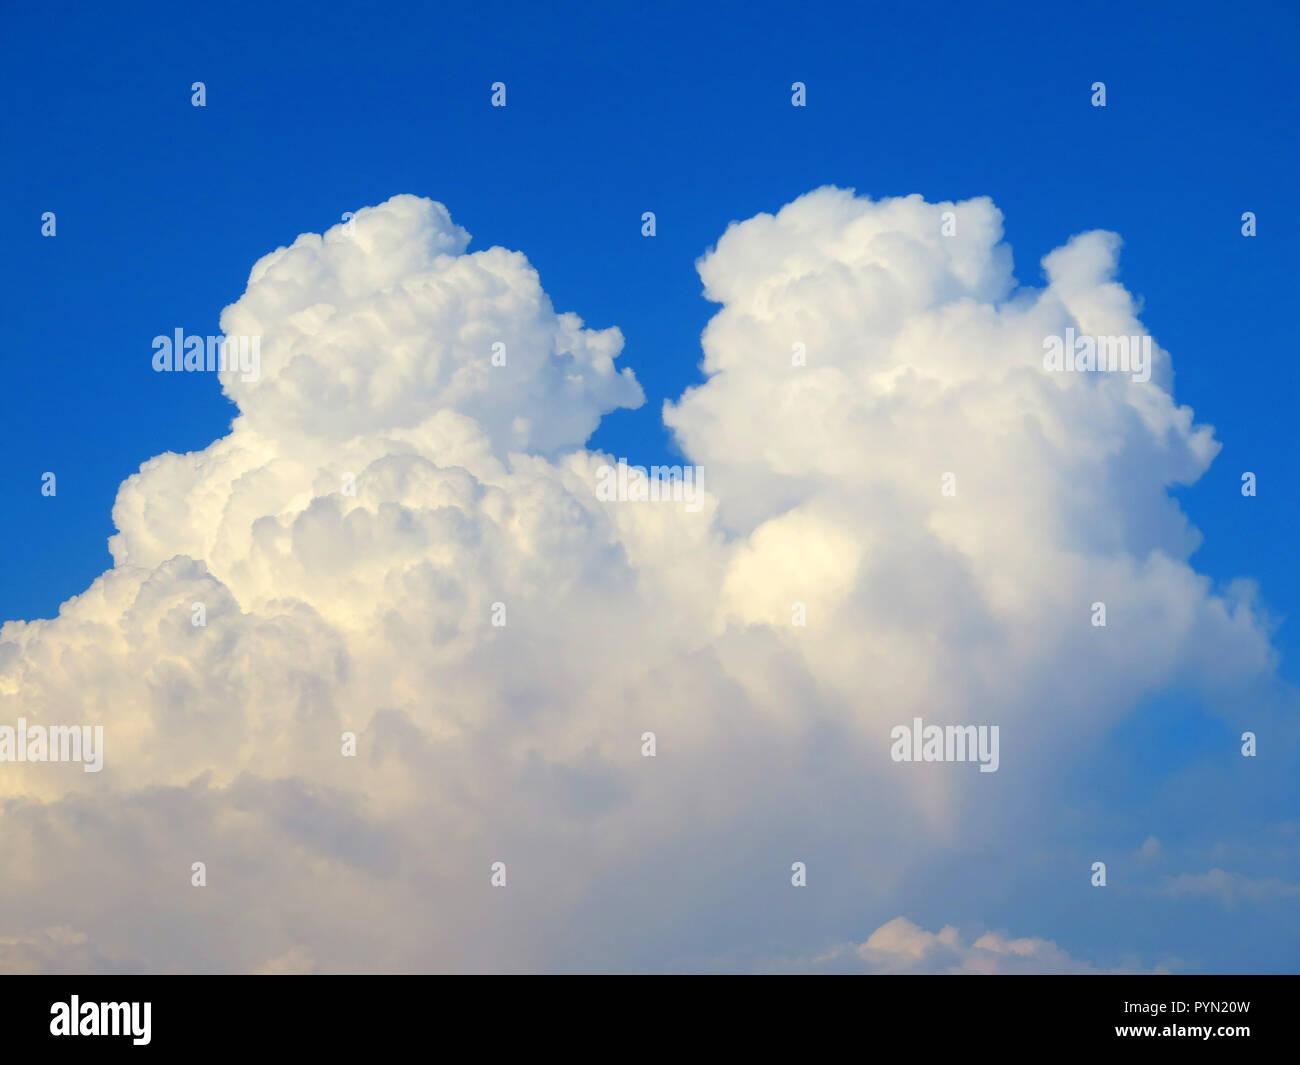 Cumulonimbus clouds over Guadalhorce Valley Andalusia, Spain